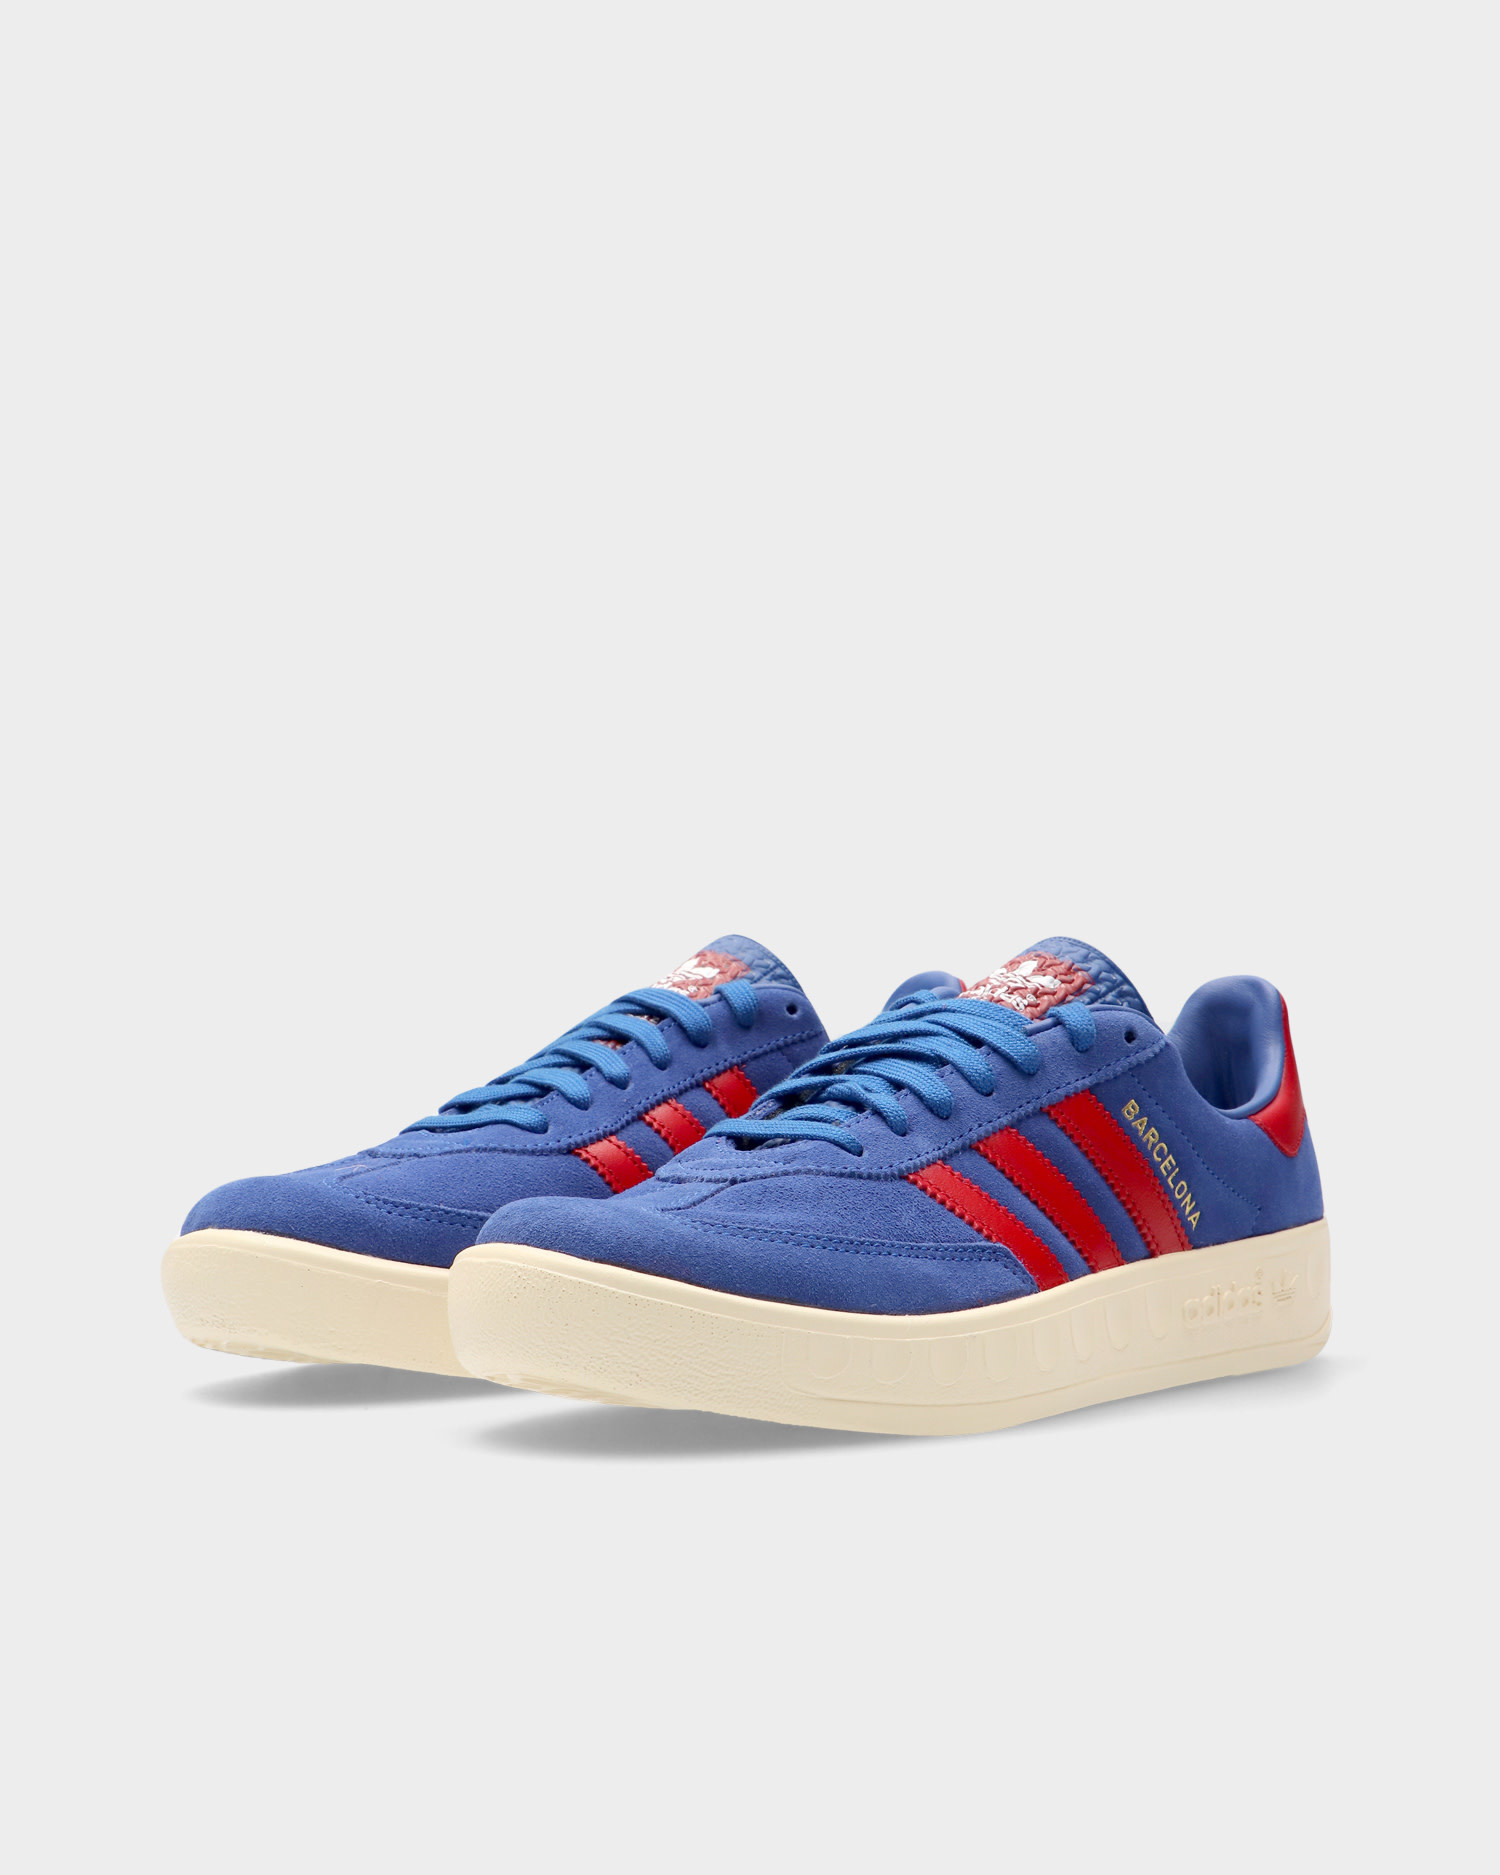 Adidas Barcelona Royal Blue/Team Power Red/Gold Metallic